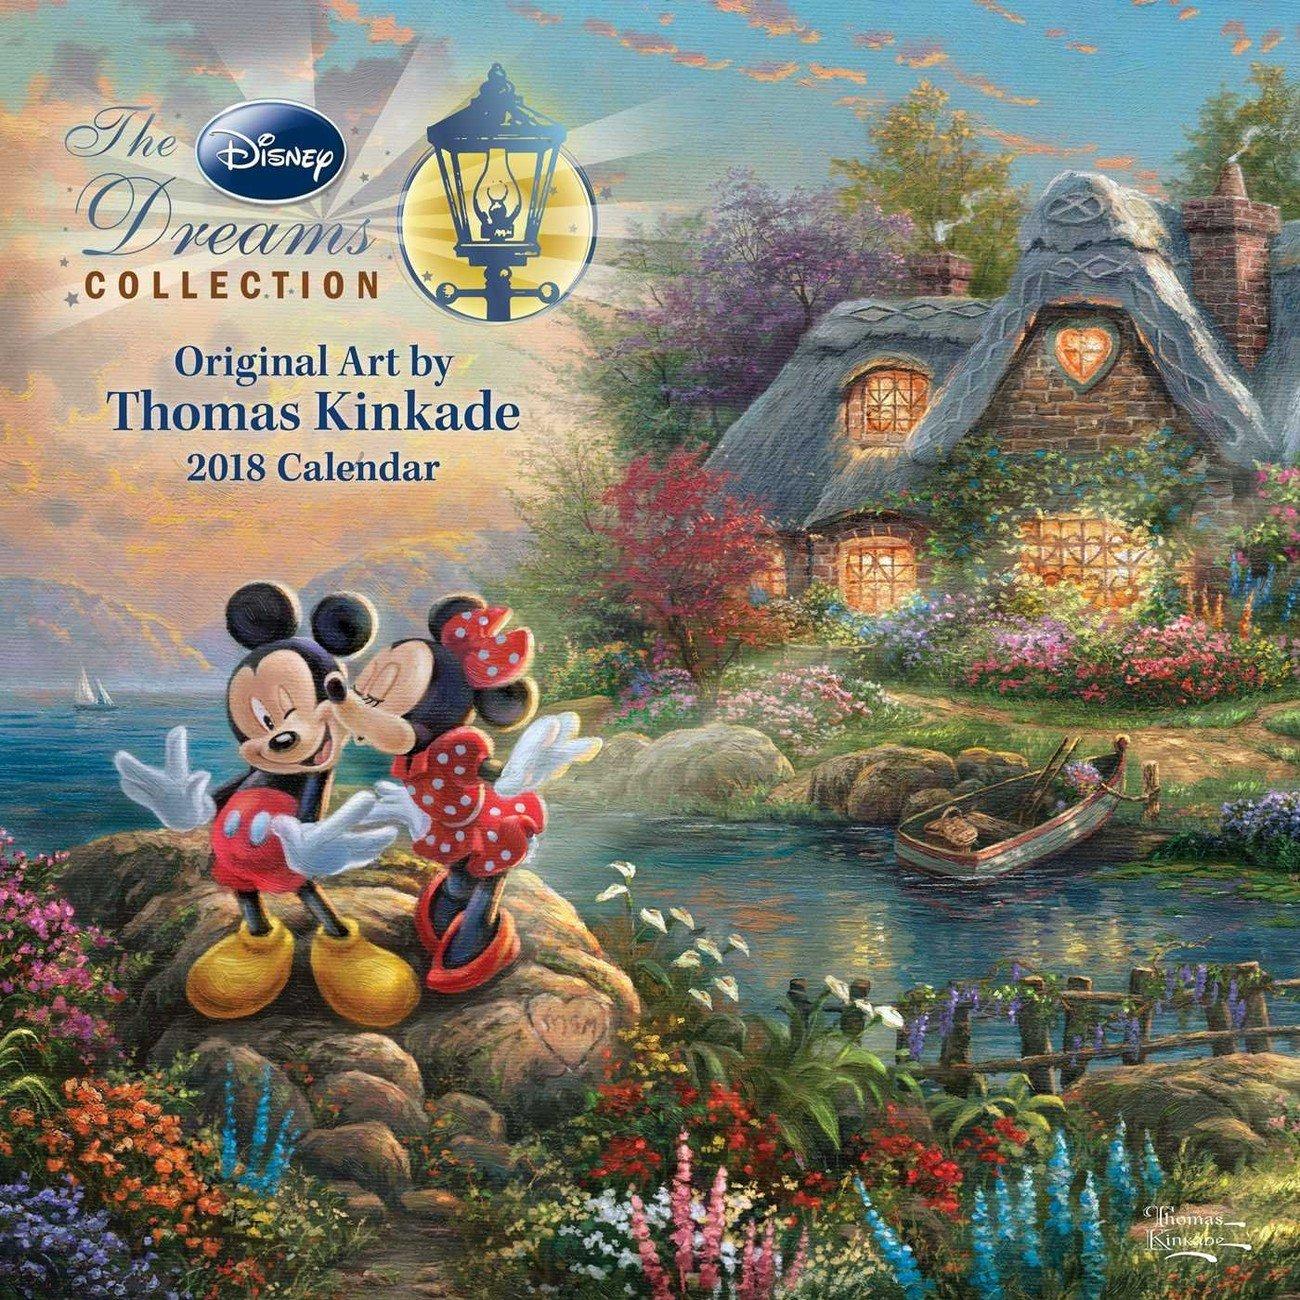 Thomas Kinkade - The Disney Dreams Collection - Calendars 2019 On Calendar 2019 Thomas Kinkade